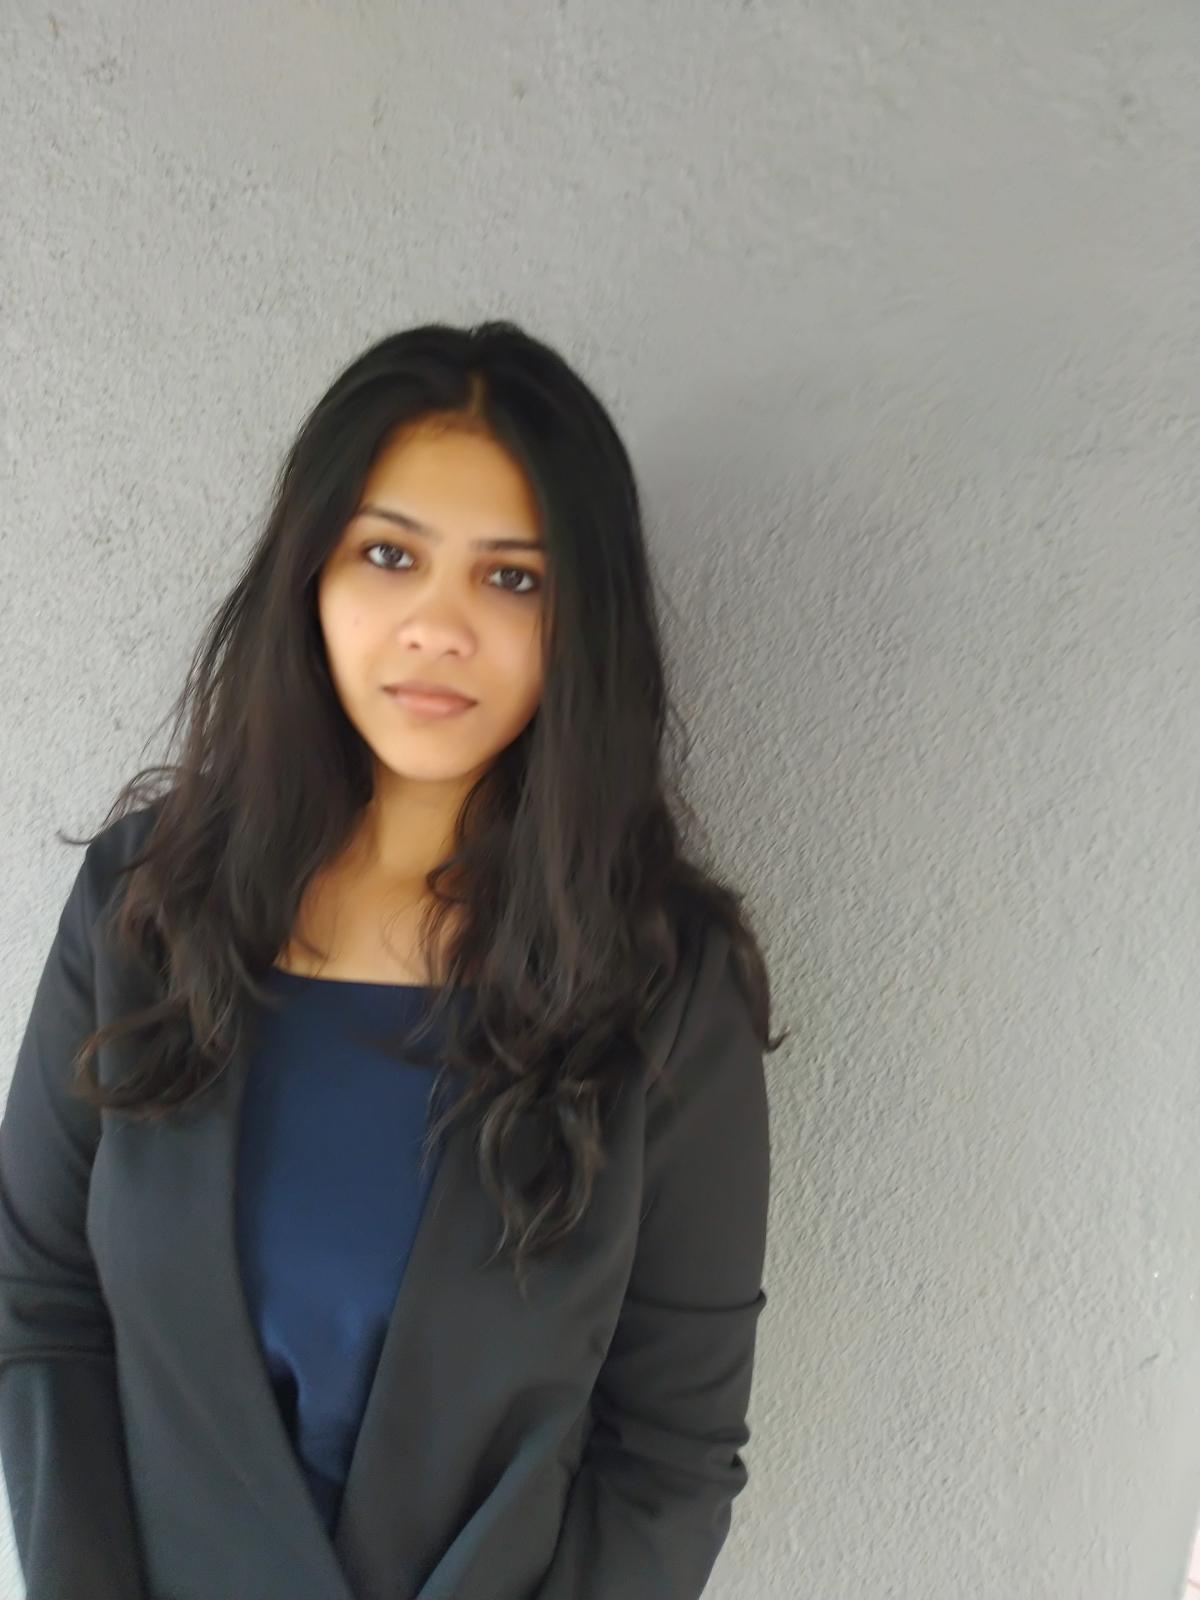 Eshika Phadke, founder, Inflawence